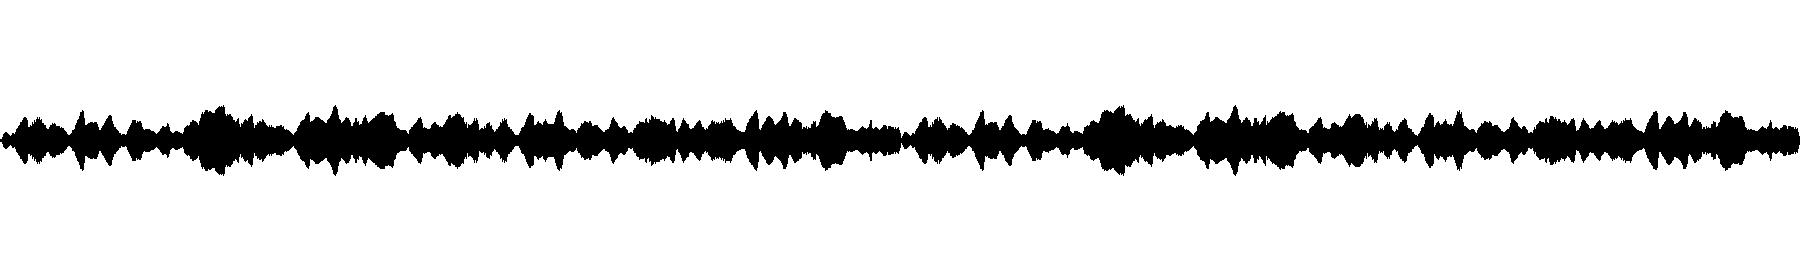 paralyzed flute melody cm 135 bpm